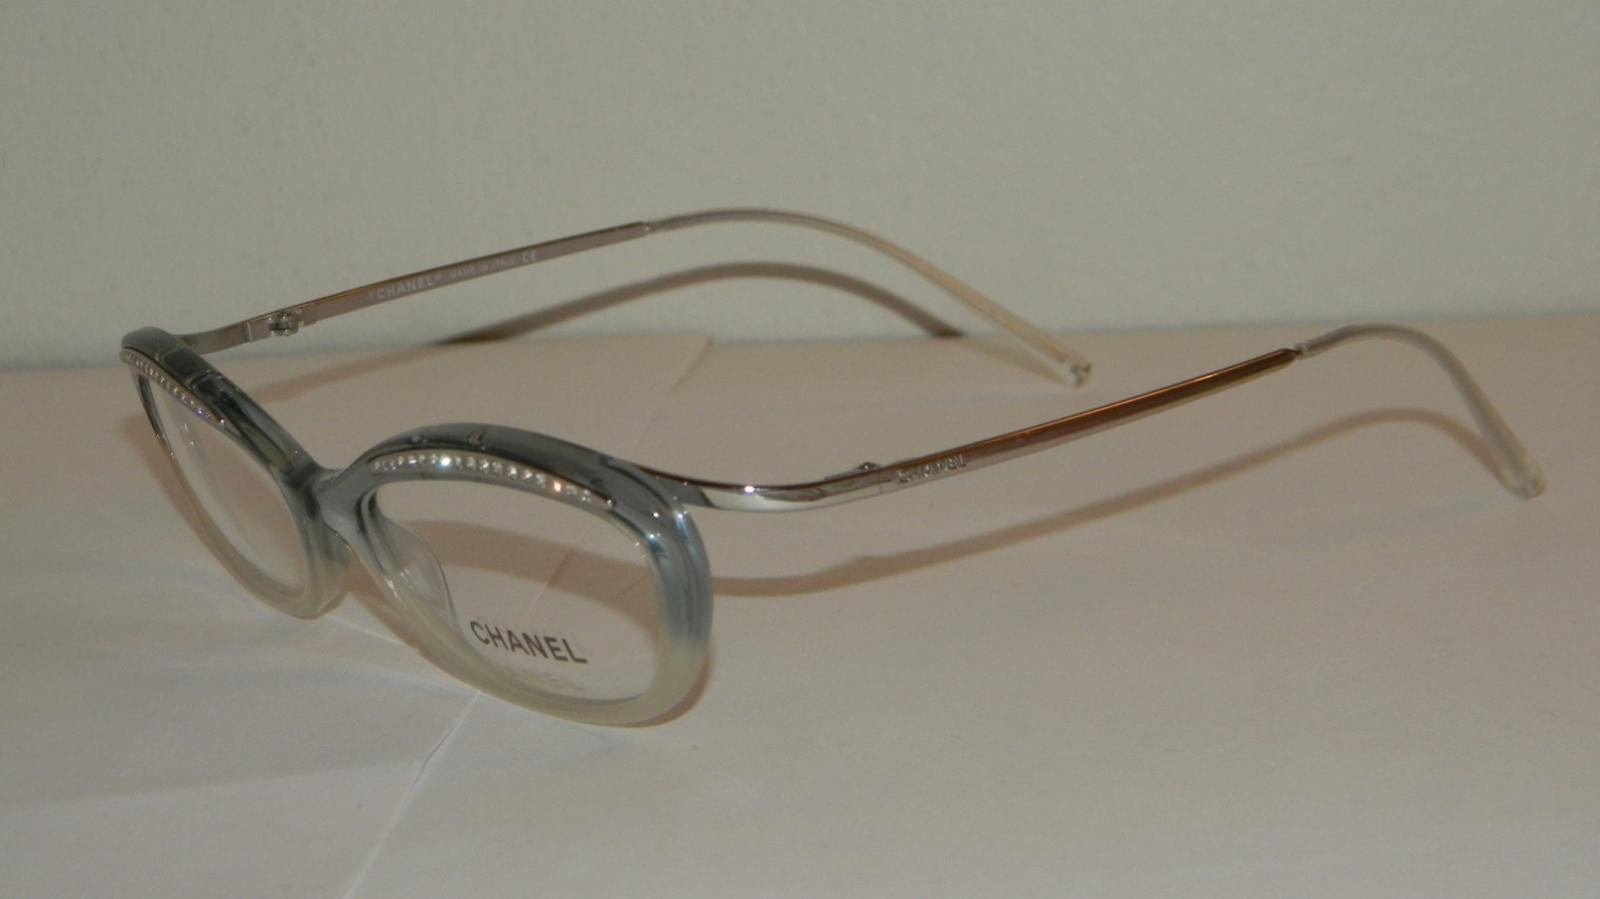 Chanel 3076b eyeglasses for Decor my eyes